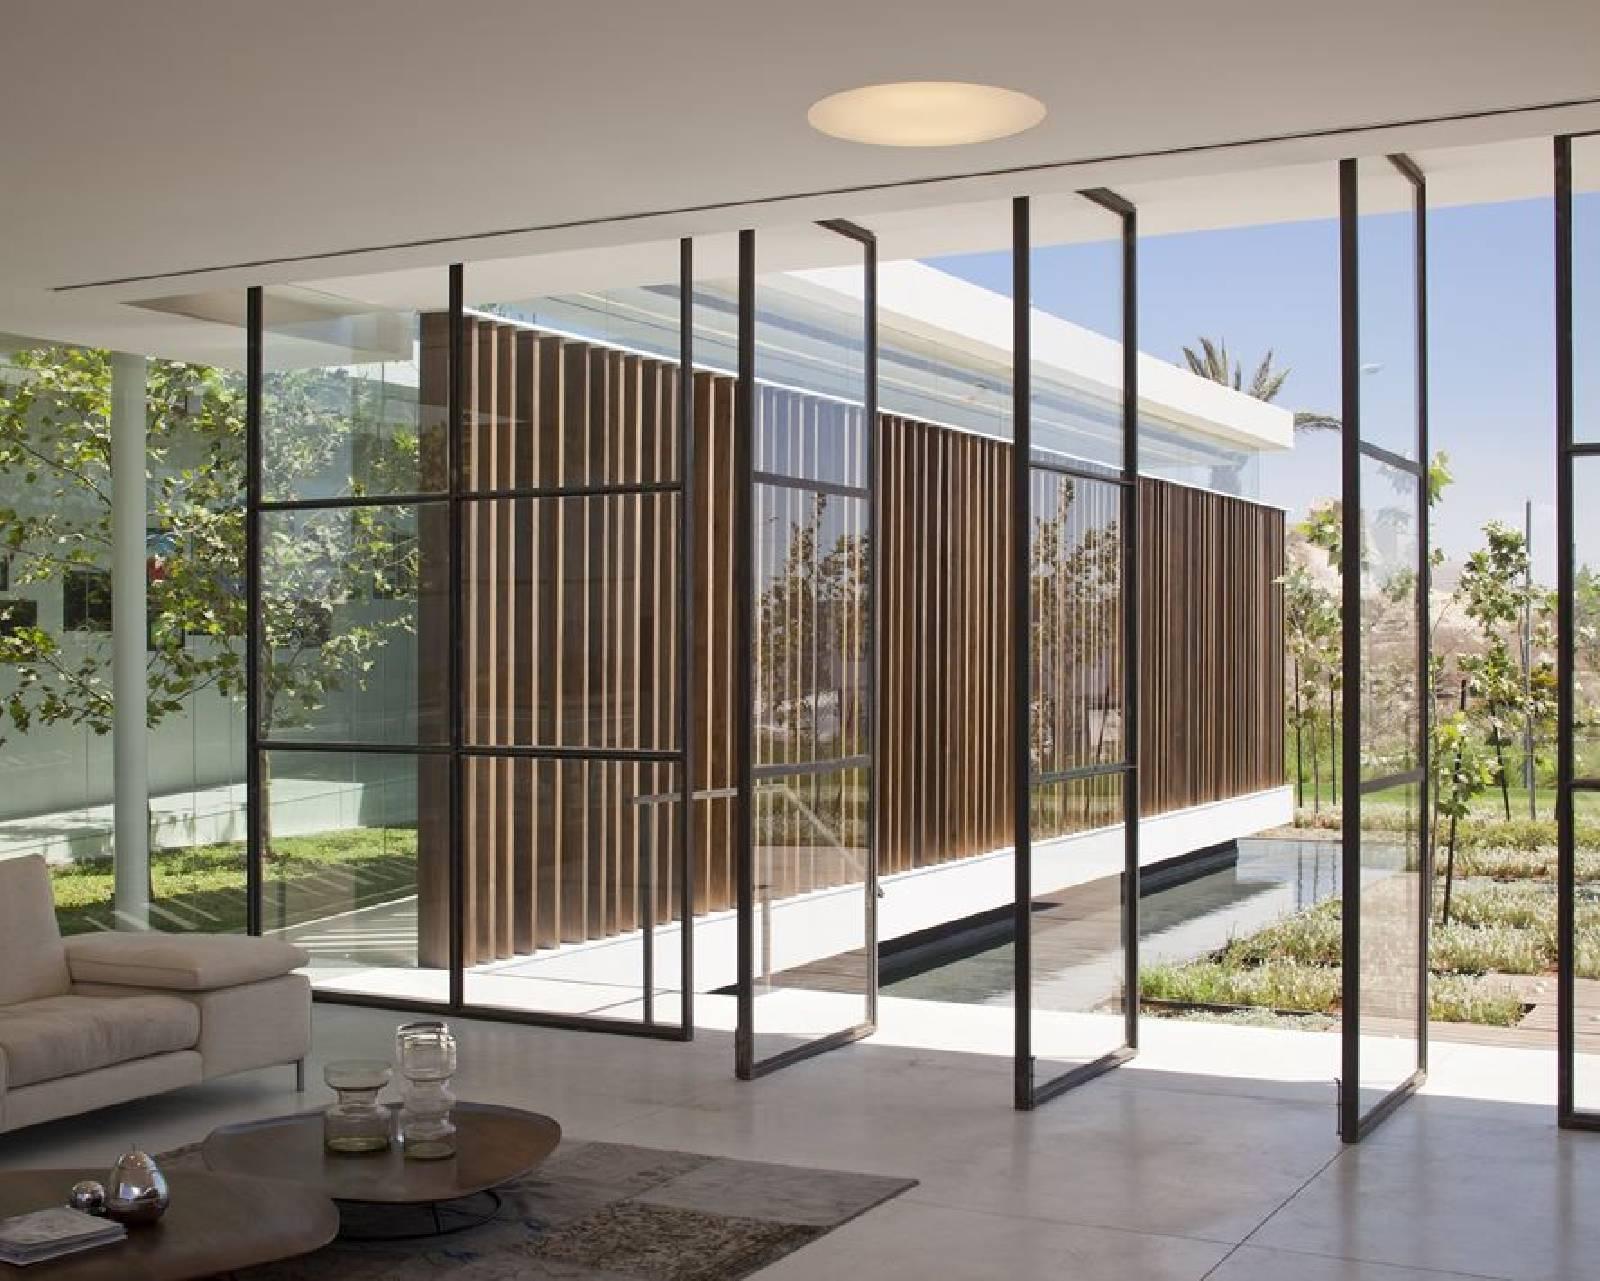 Gindi Holdings Sales Center By Pitsou Kedem Architects A